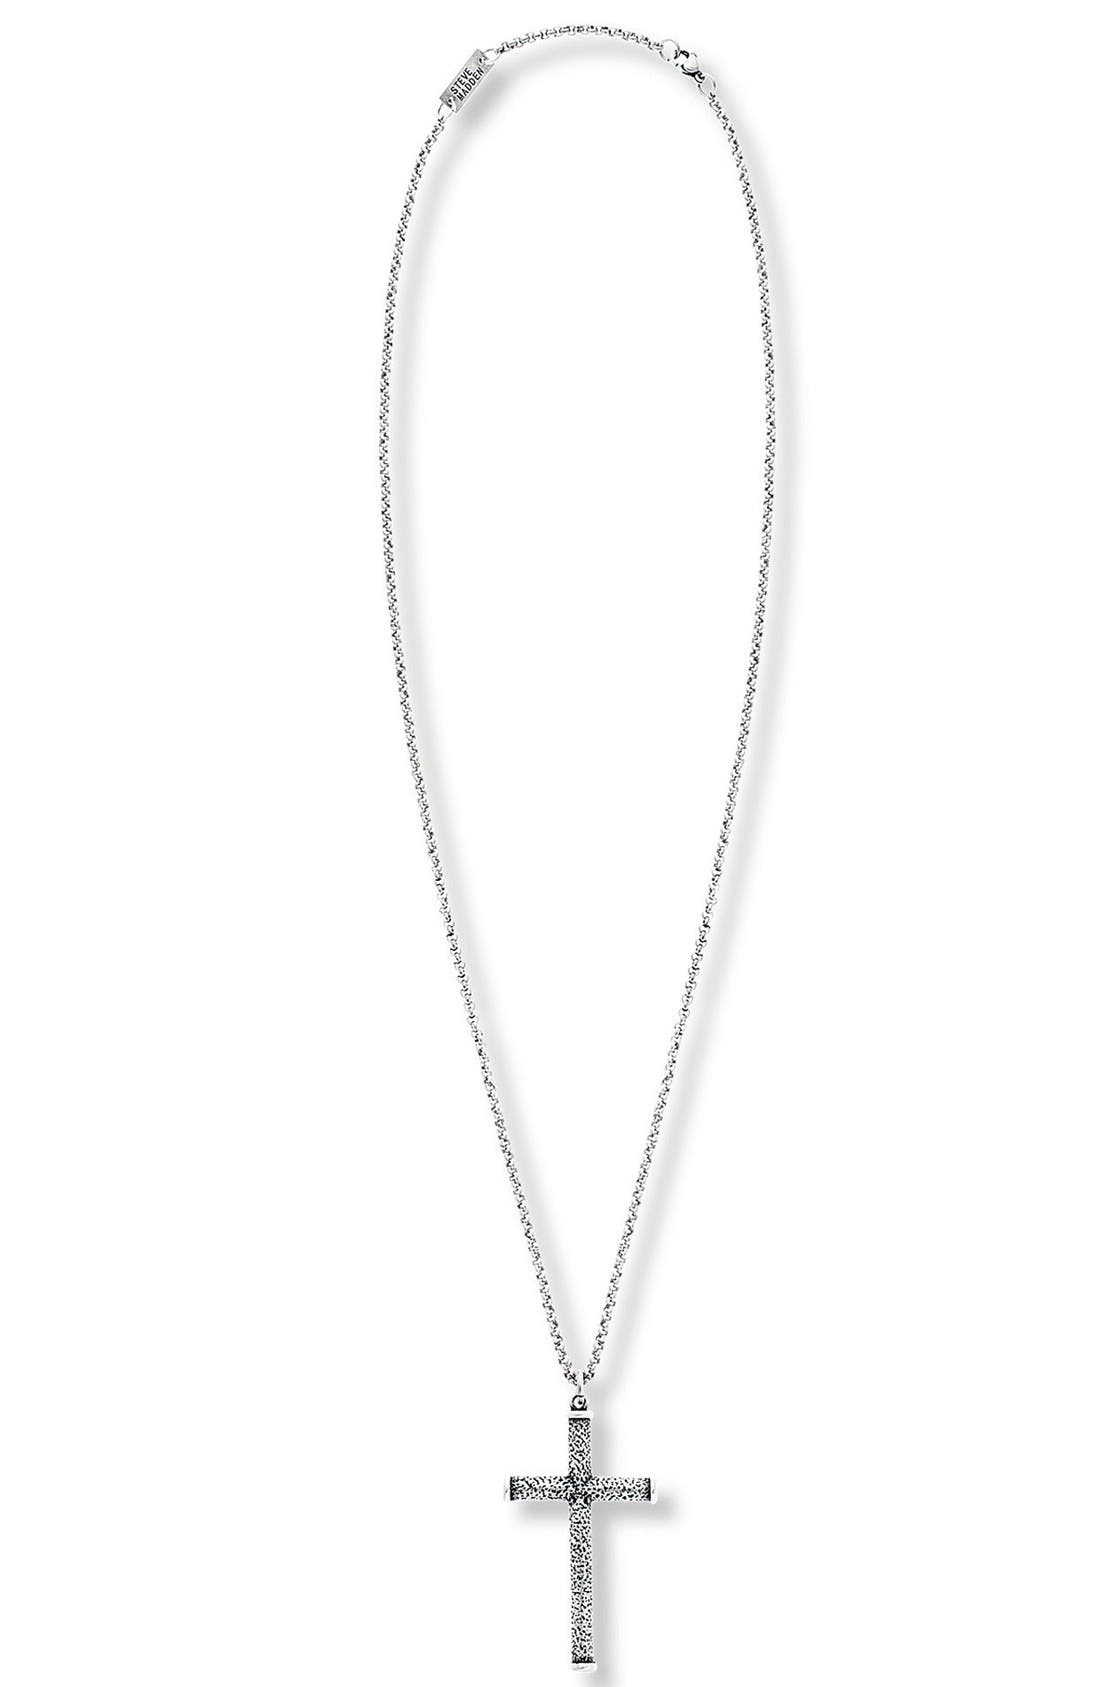 Main Image - Steve Madden Hammered Cross Pendant Necklace